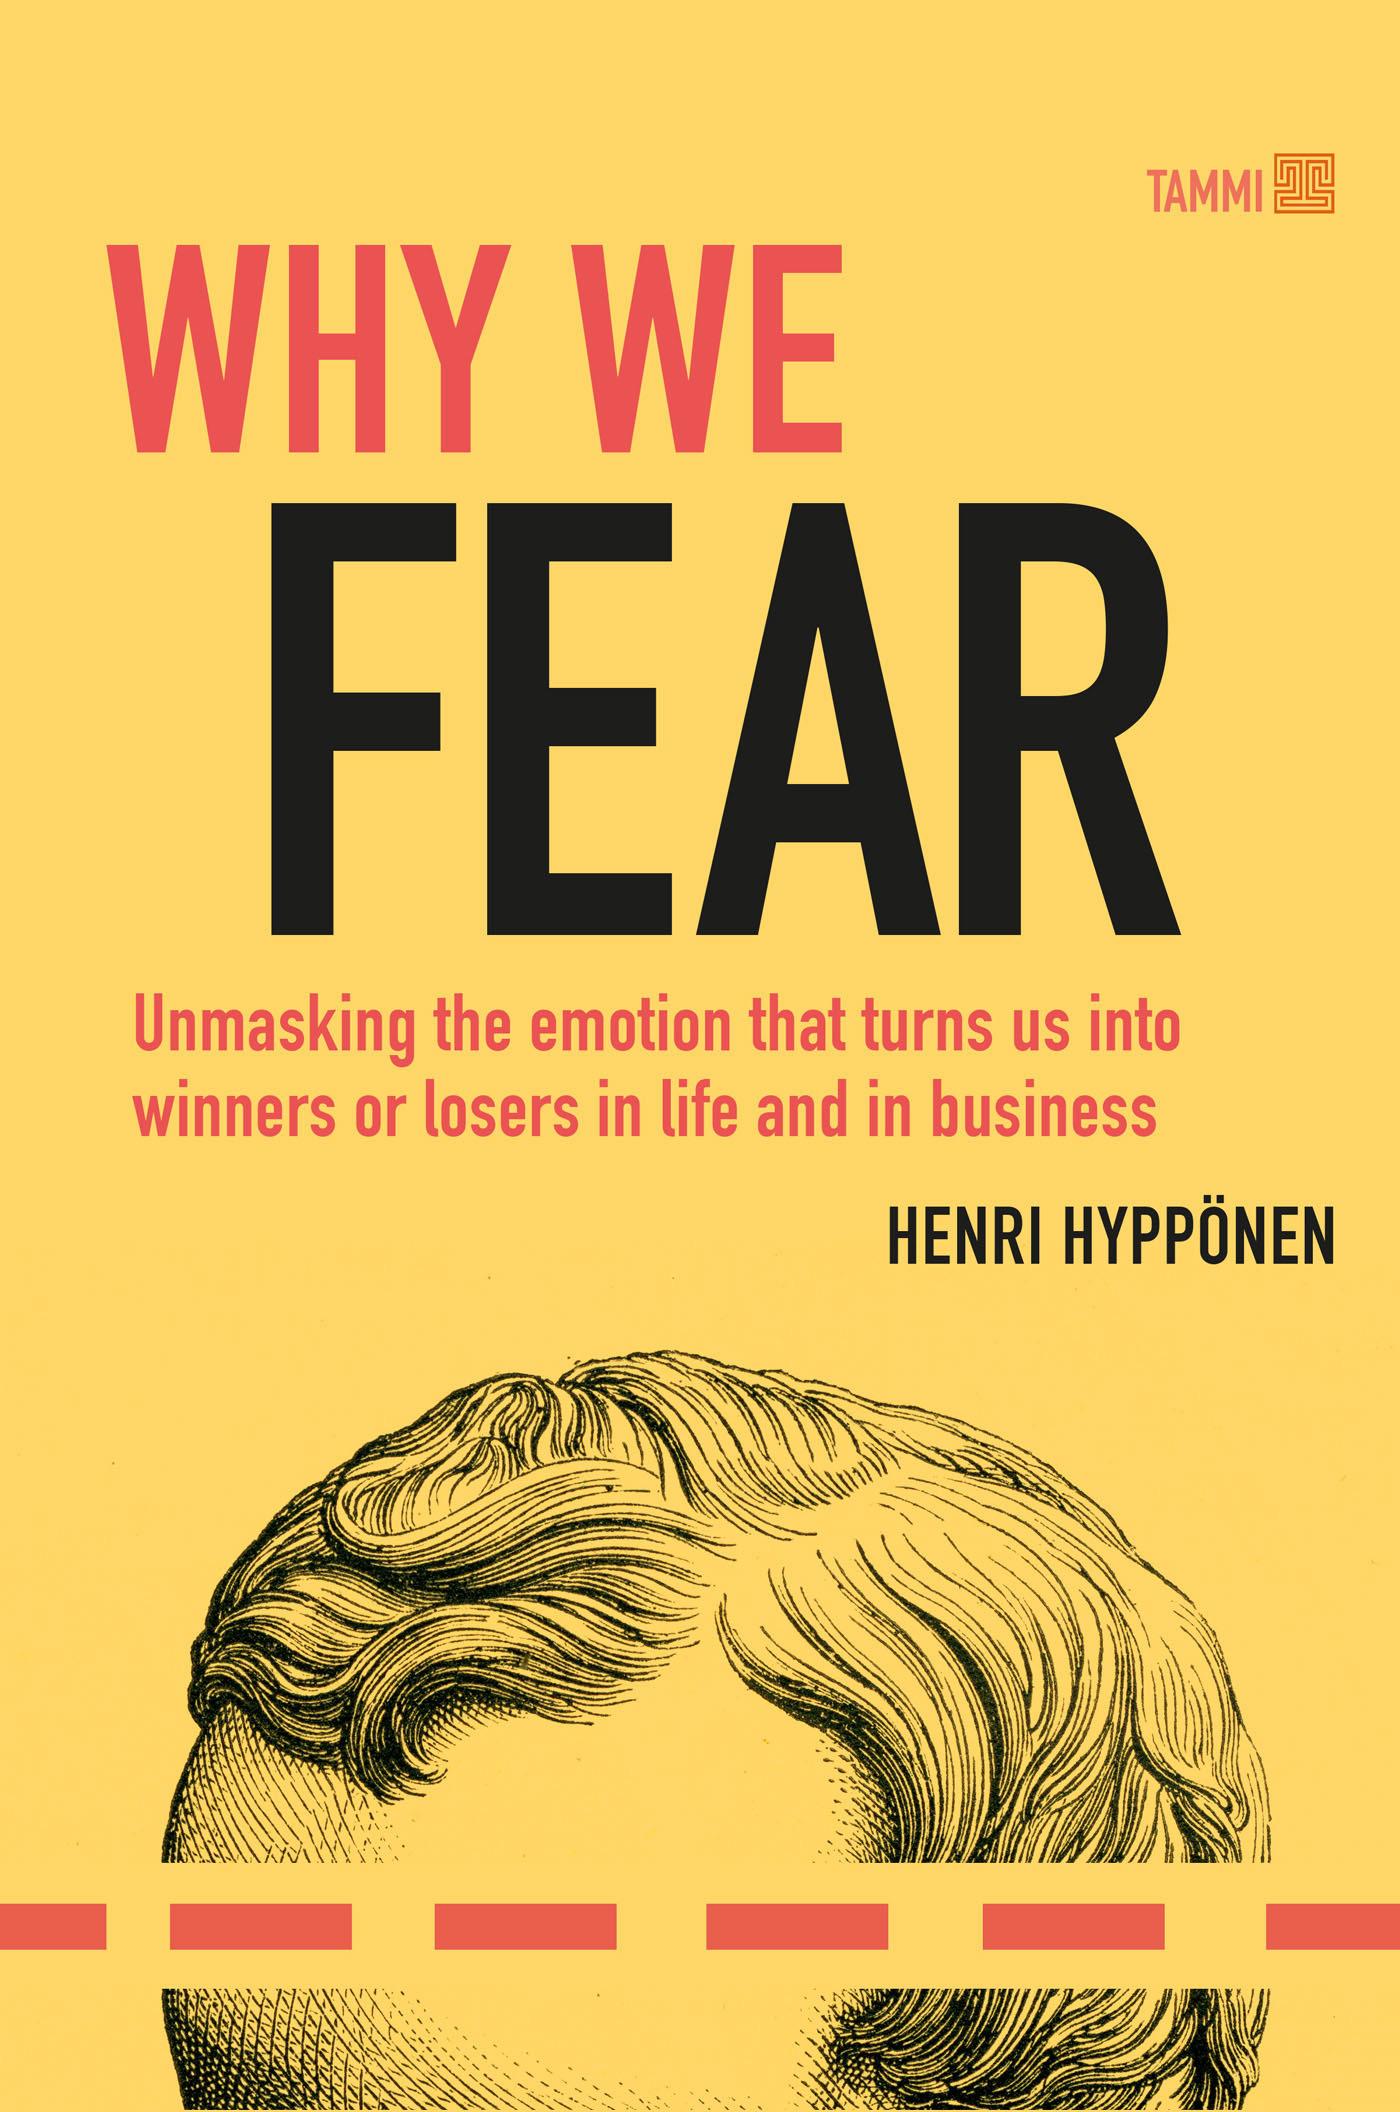 Hyppönen, Henkka - Why We Fear, ebook